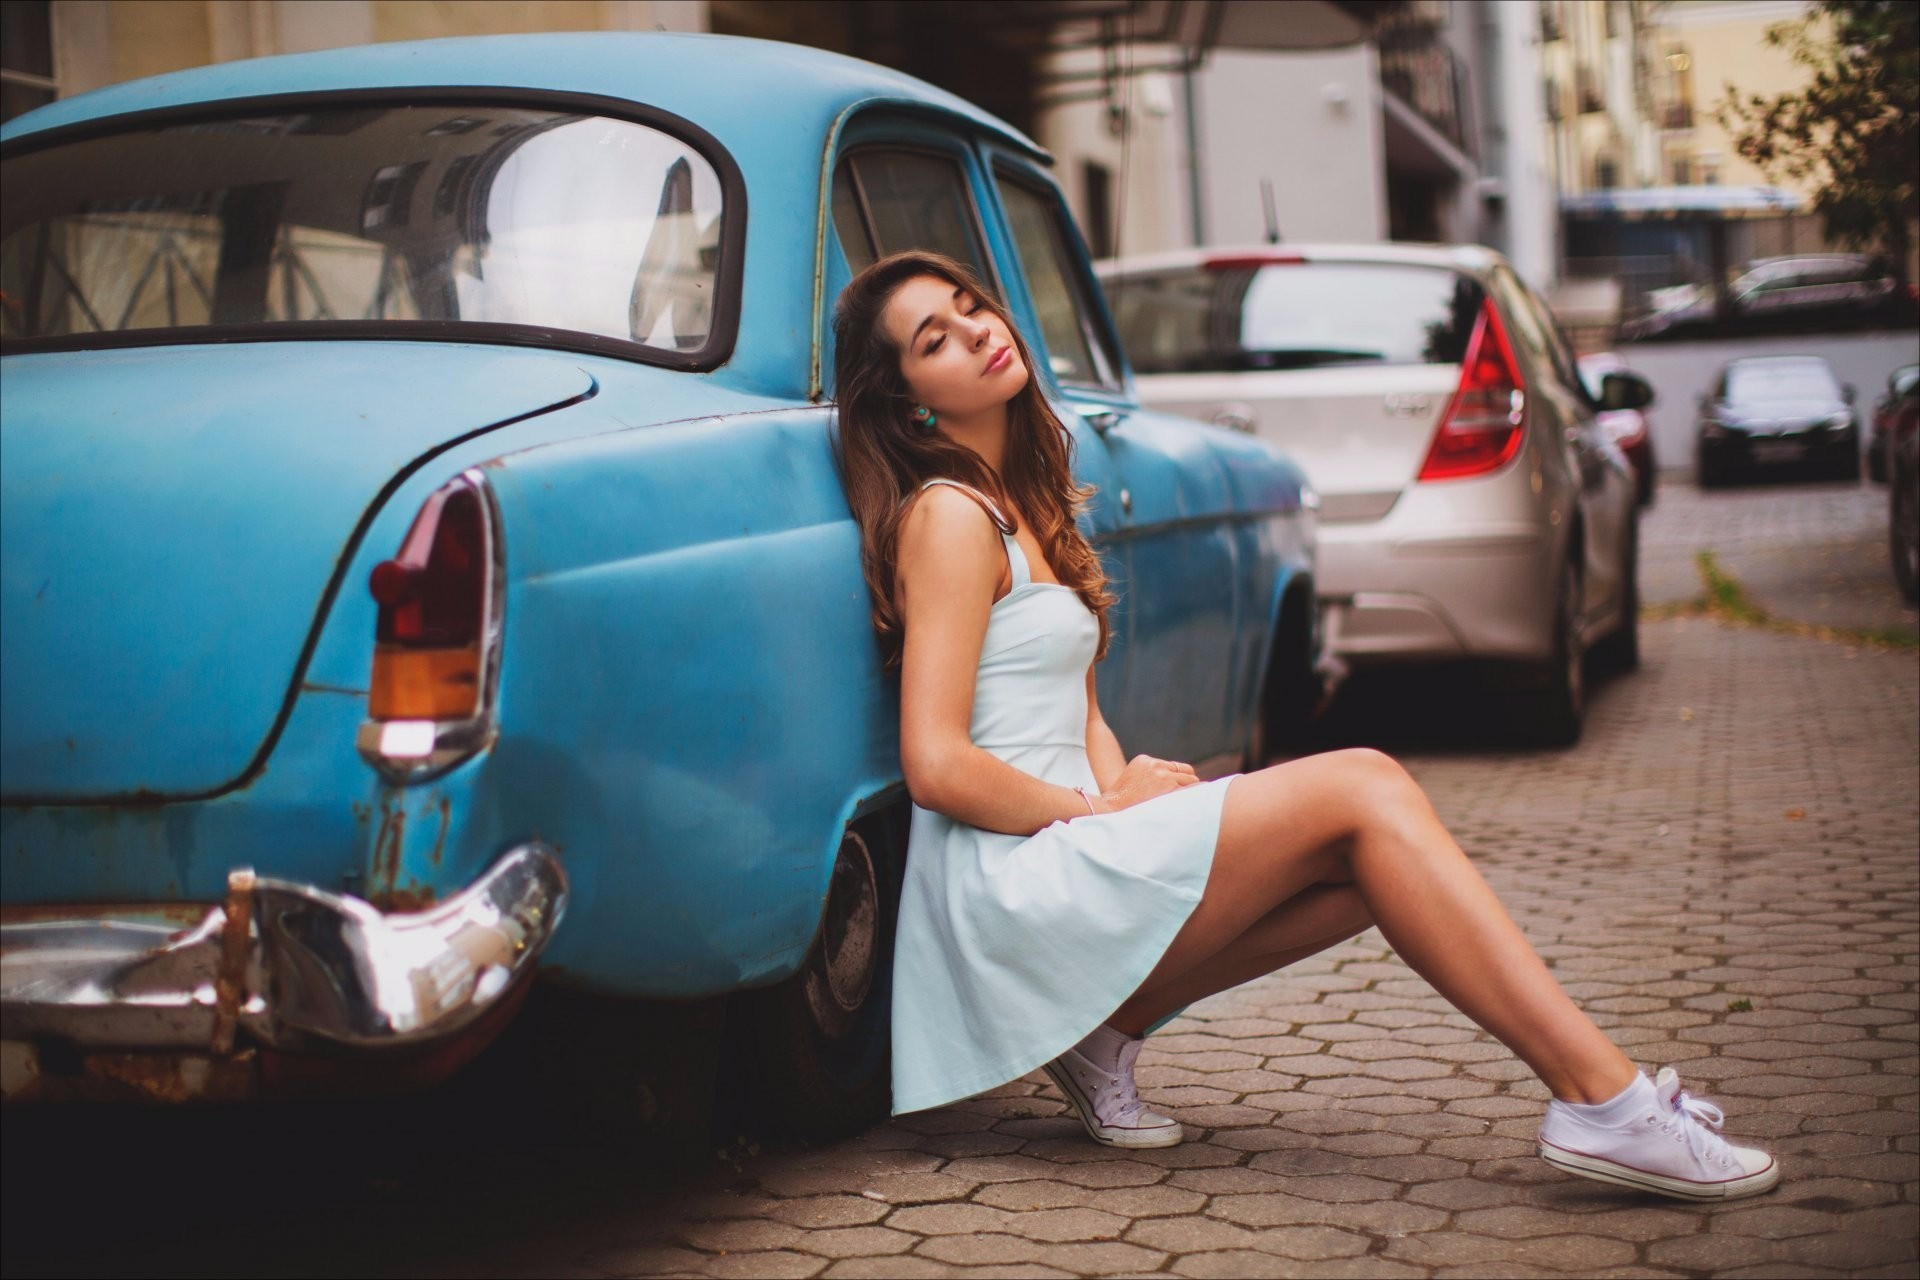 2048x1152 Model With Classic Car 2 2048x1152 Resolution HD 4k ...